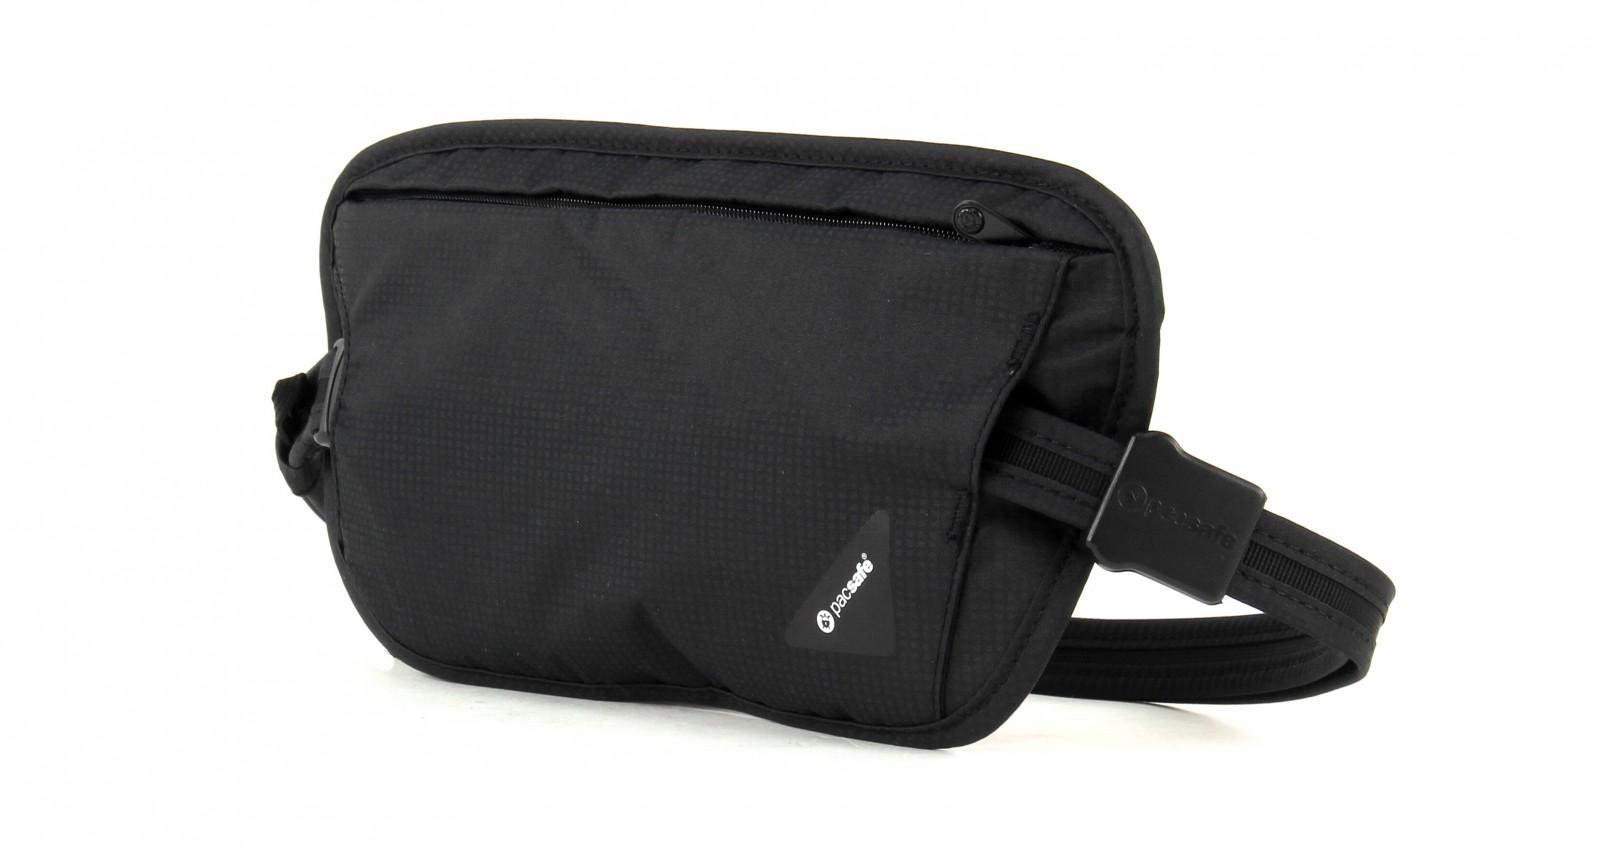 pacsafe Coversafe X100 Anti-Theft RFID Blocking Waist Wallet Black